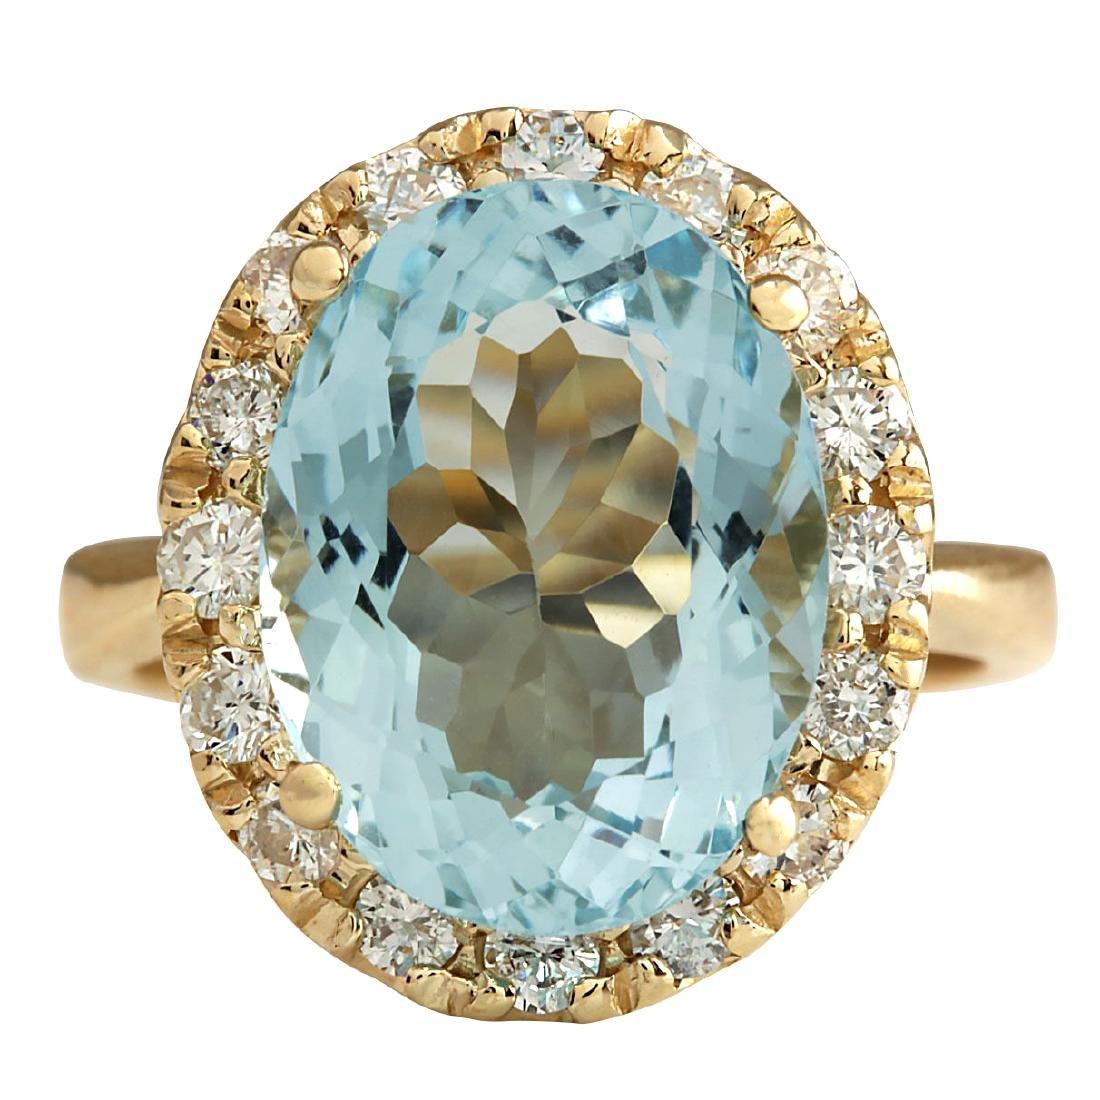 5.32CTW Natural Aquamarine And Diamond Ring 18K Solid